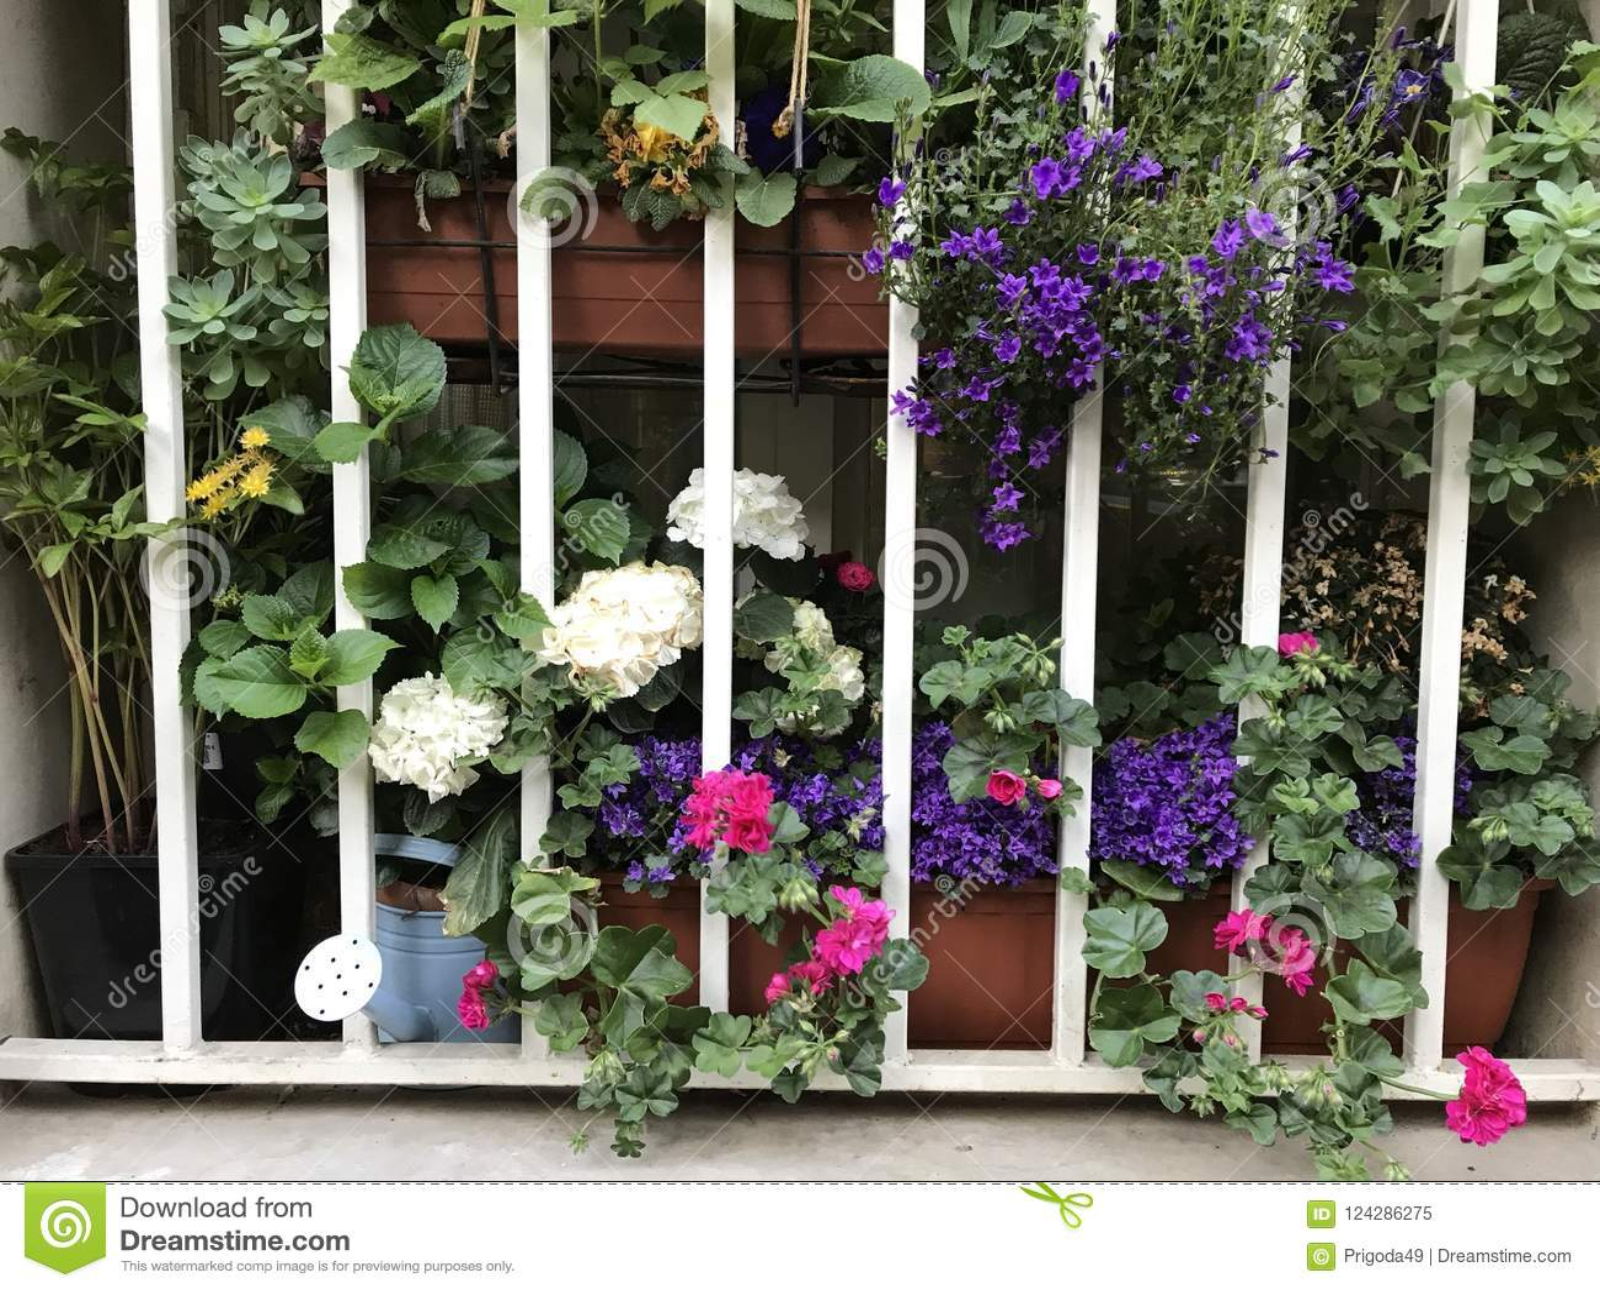 Flowers behind the grid stock image image of purple 124286275 download flowers behind the grid stock image image of purple 124286275 izmirmasajfo